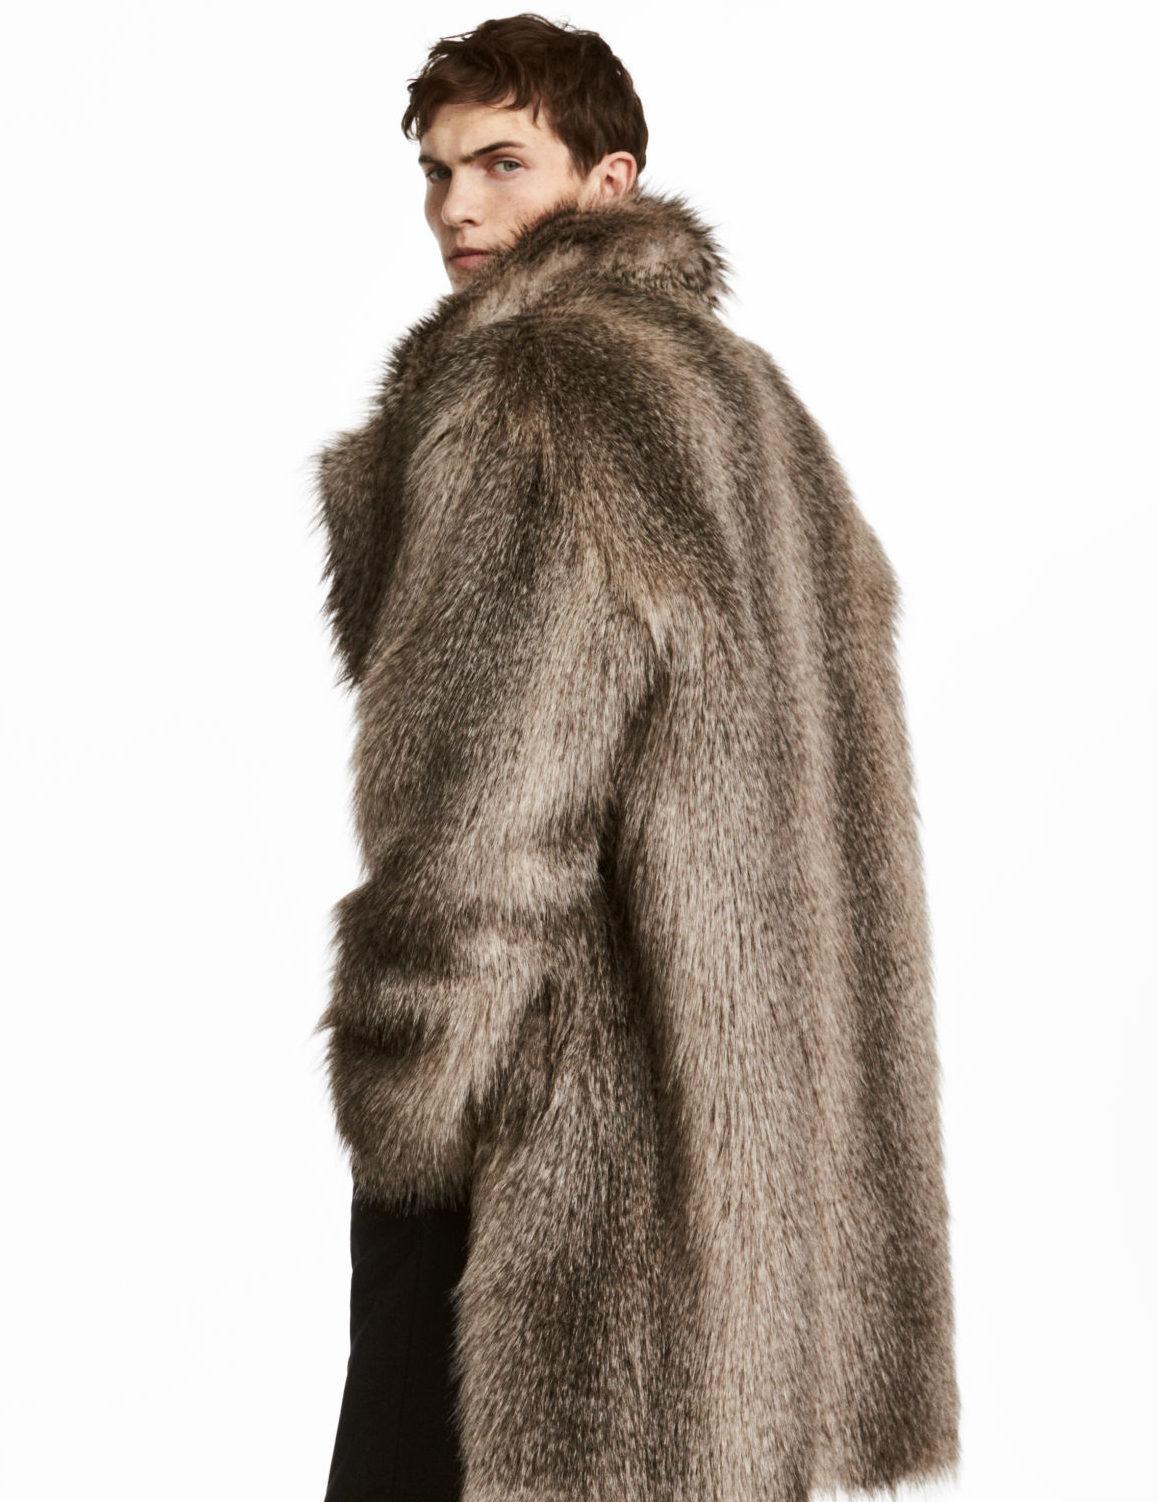 H&M Men's Faux Fur Coat Fuskpäls herr H&M